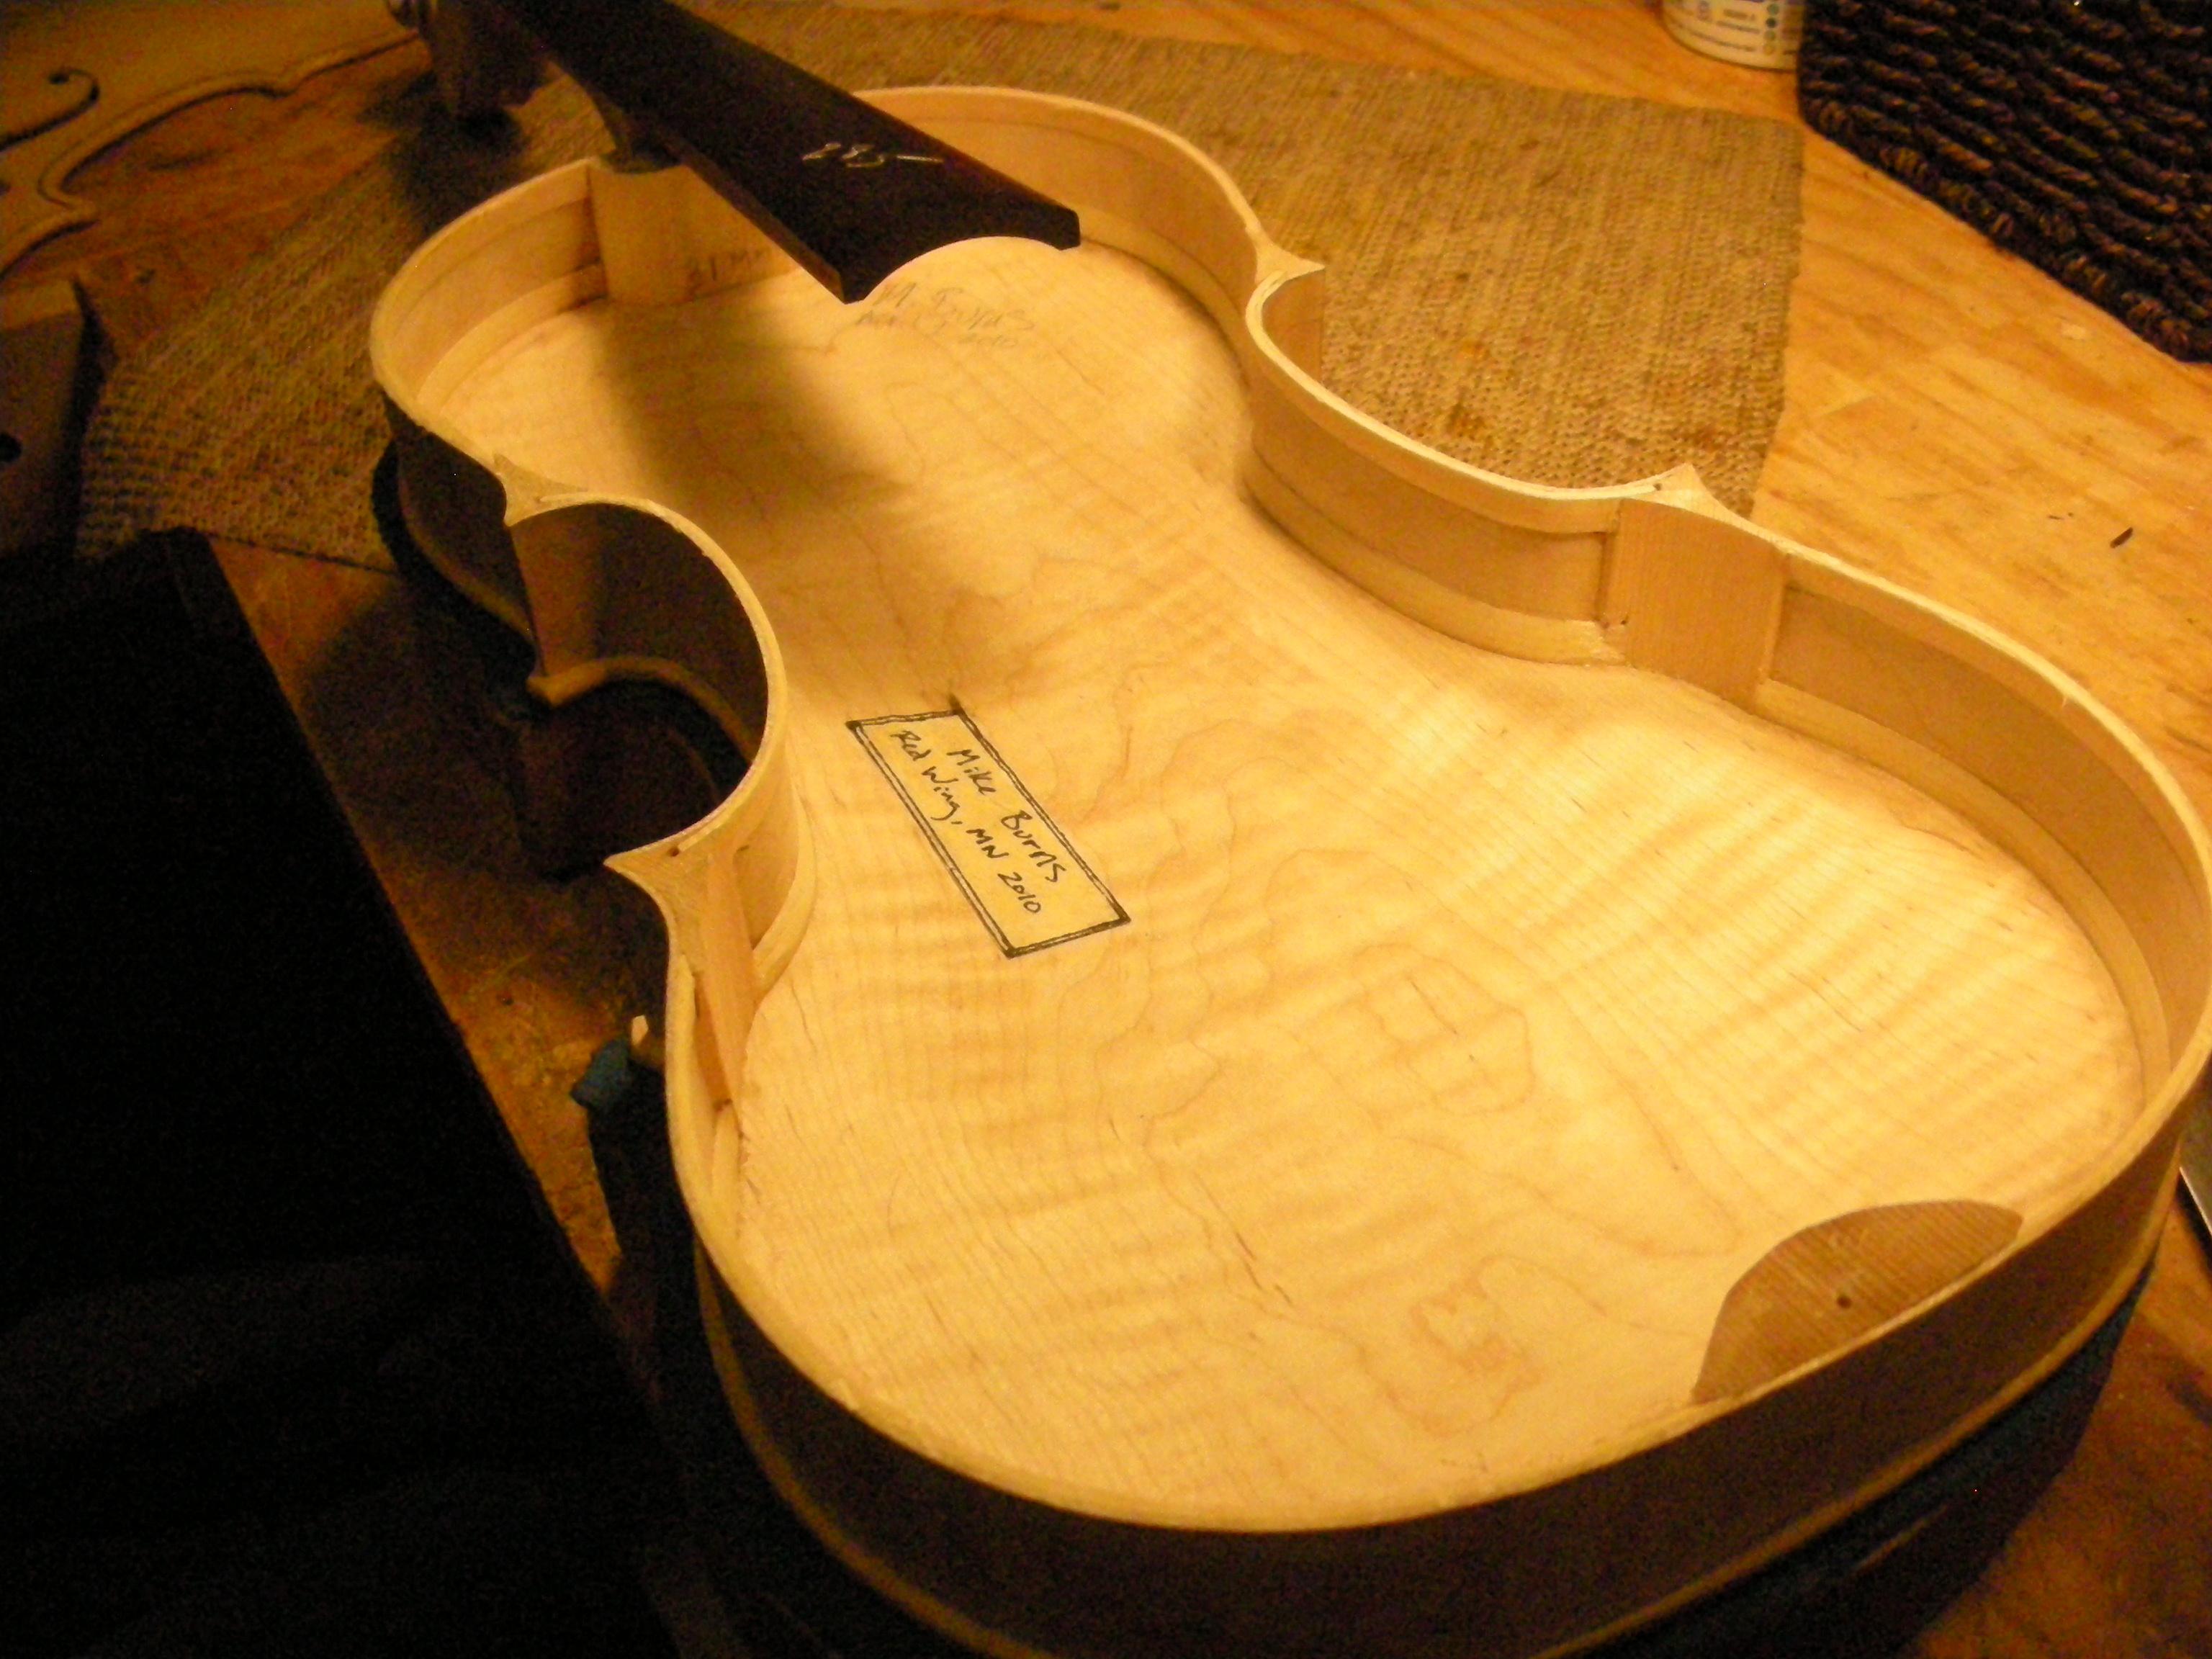 preparing to close new violin box